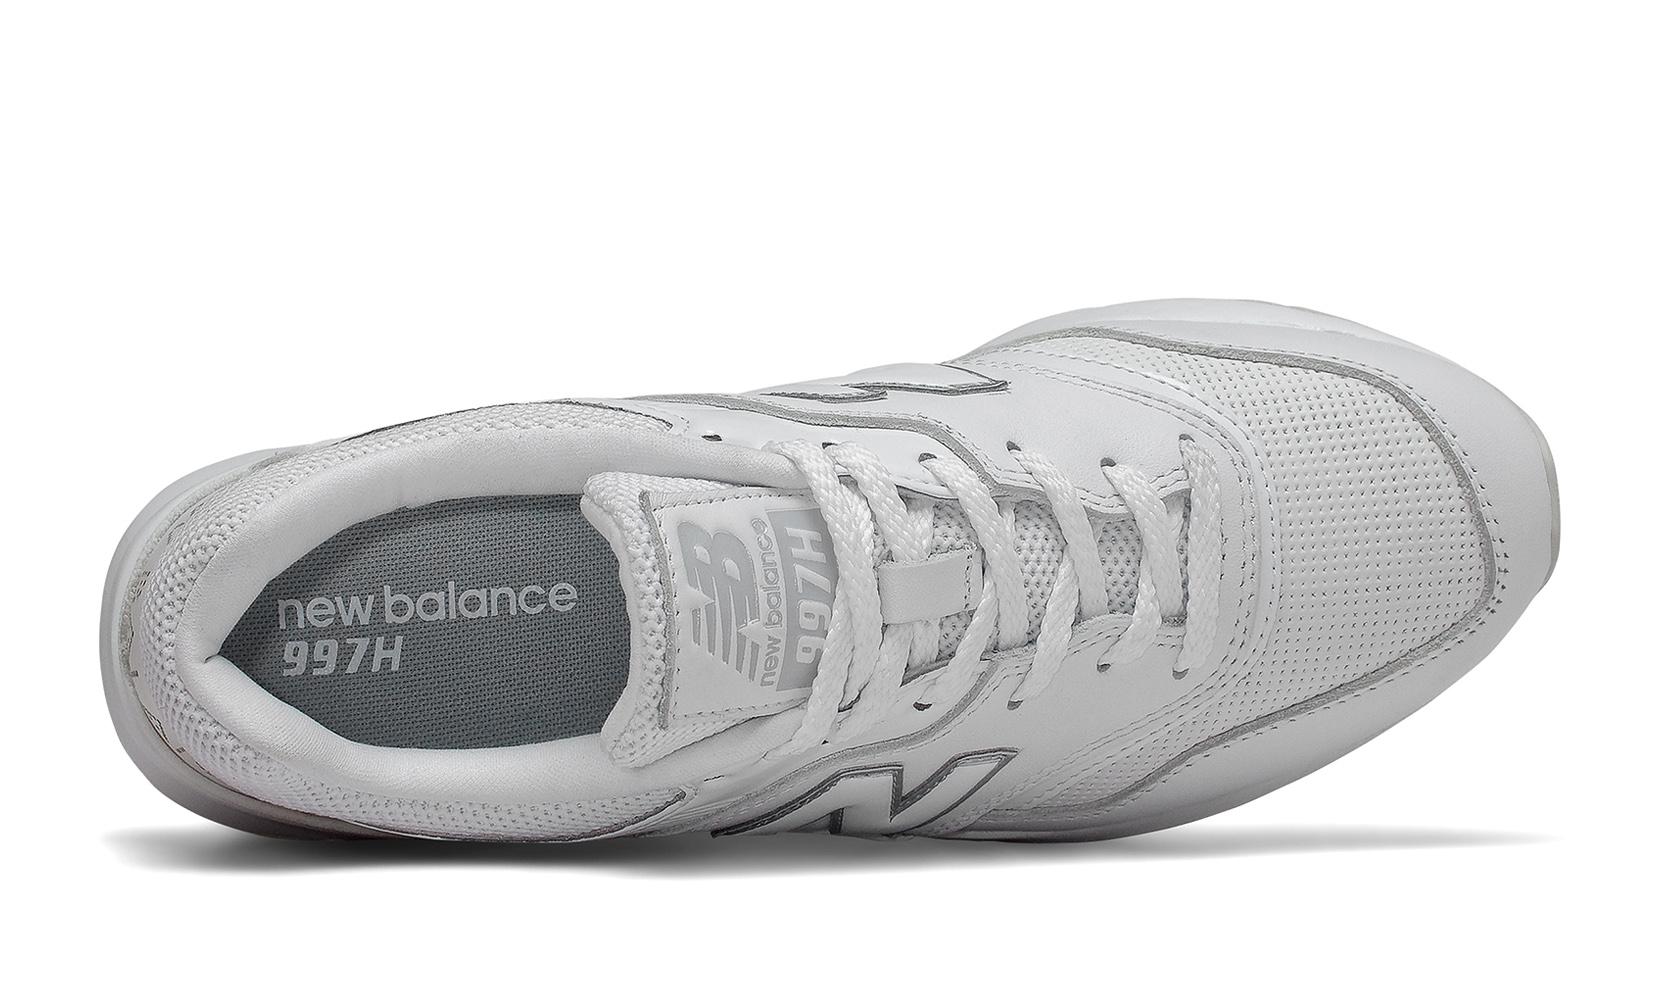 Жіноче взуття повсякденне New Balance 997Н CW997HLA   New Balance